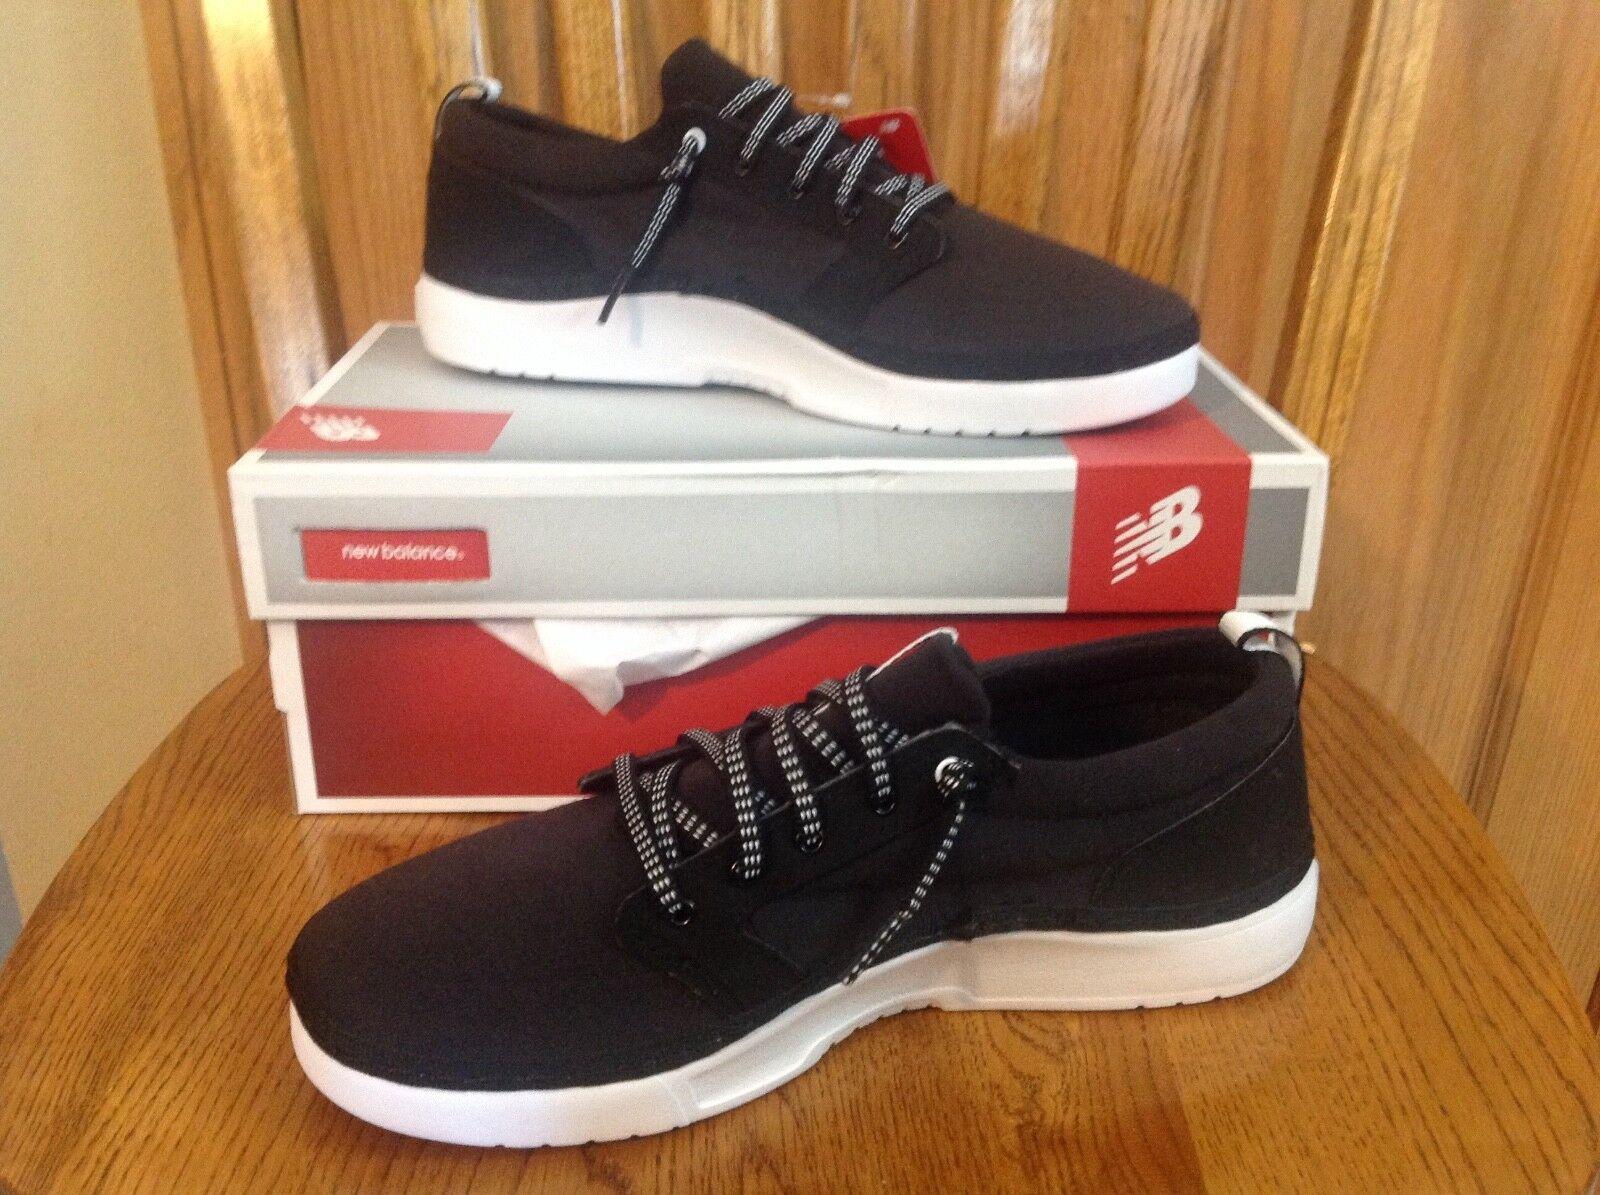 NEW-New Balance Men's Transitional Shoes-Croc like/Slide/Floats (Apres bhh)